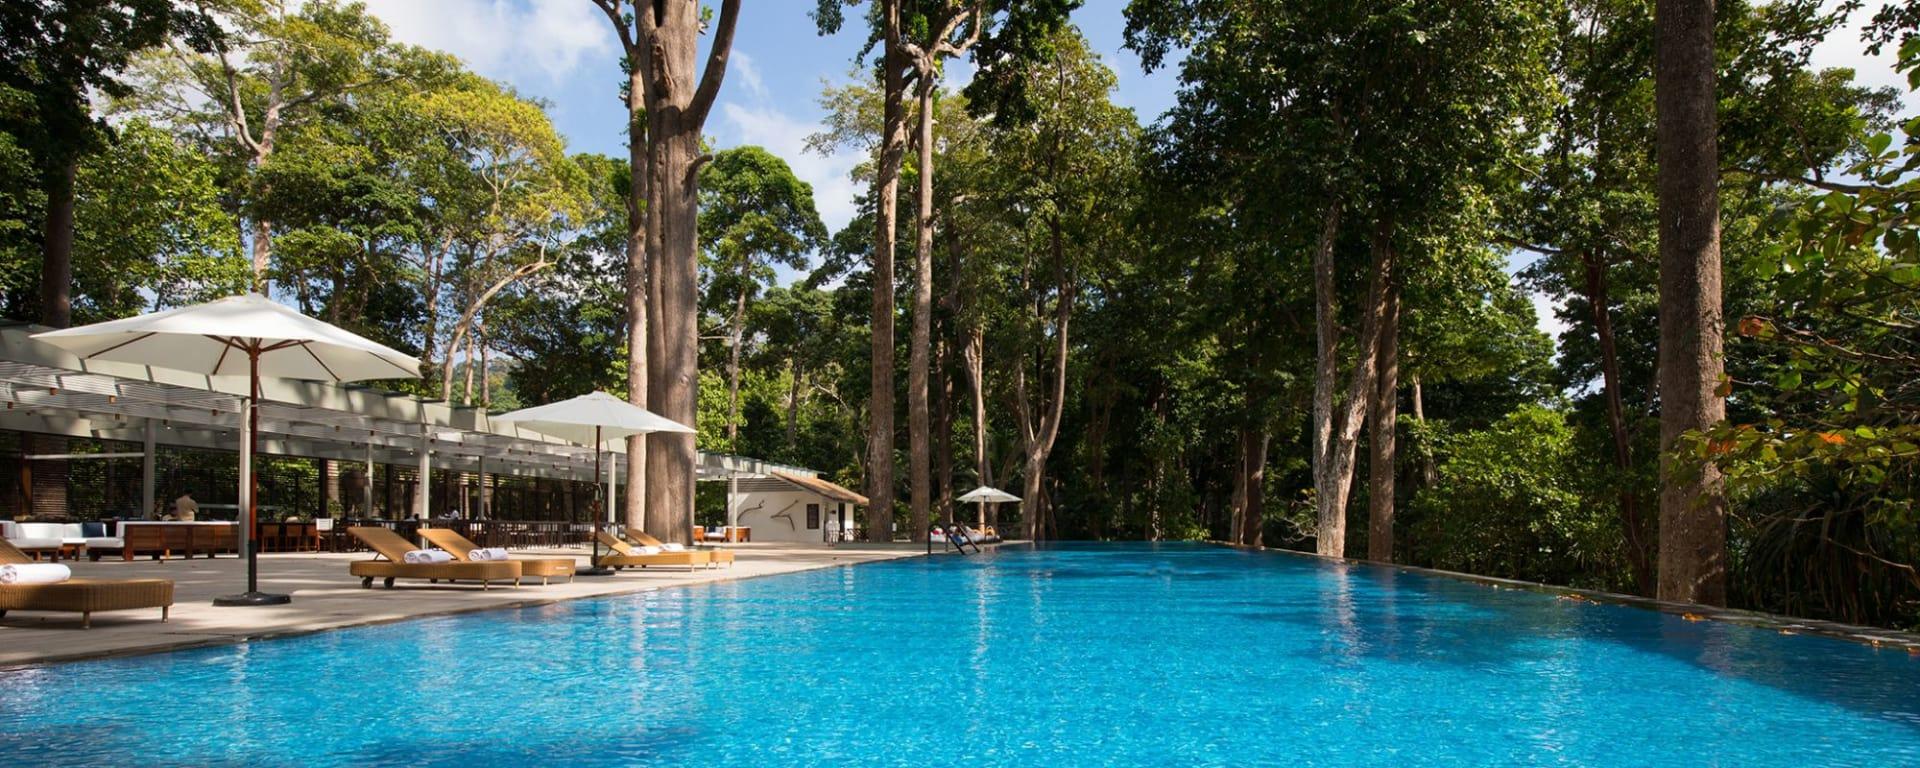 Taj Exotica Resort & Spa in Andamanen: Taj Exotica Resort & Spa, Andamans 004